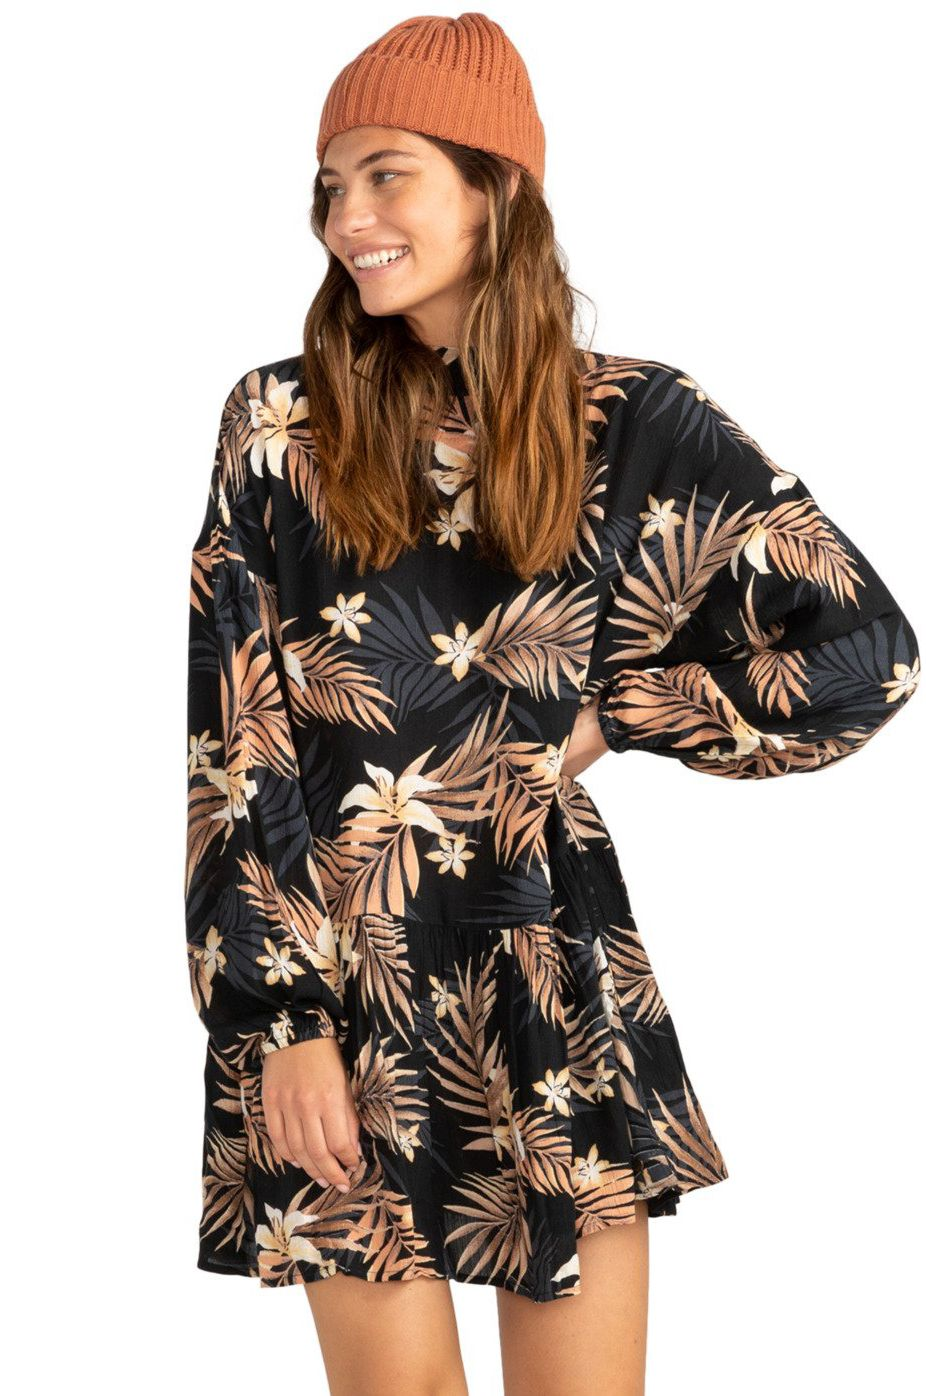 Billabong Dress HAPPY MIND PARADISE FOUND Black Multi